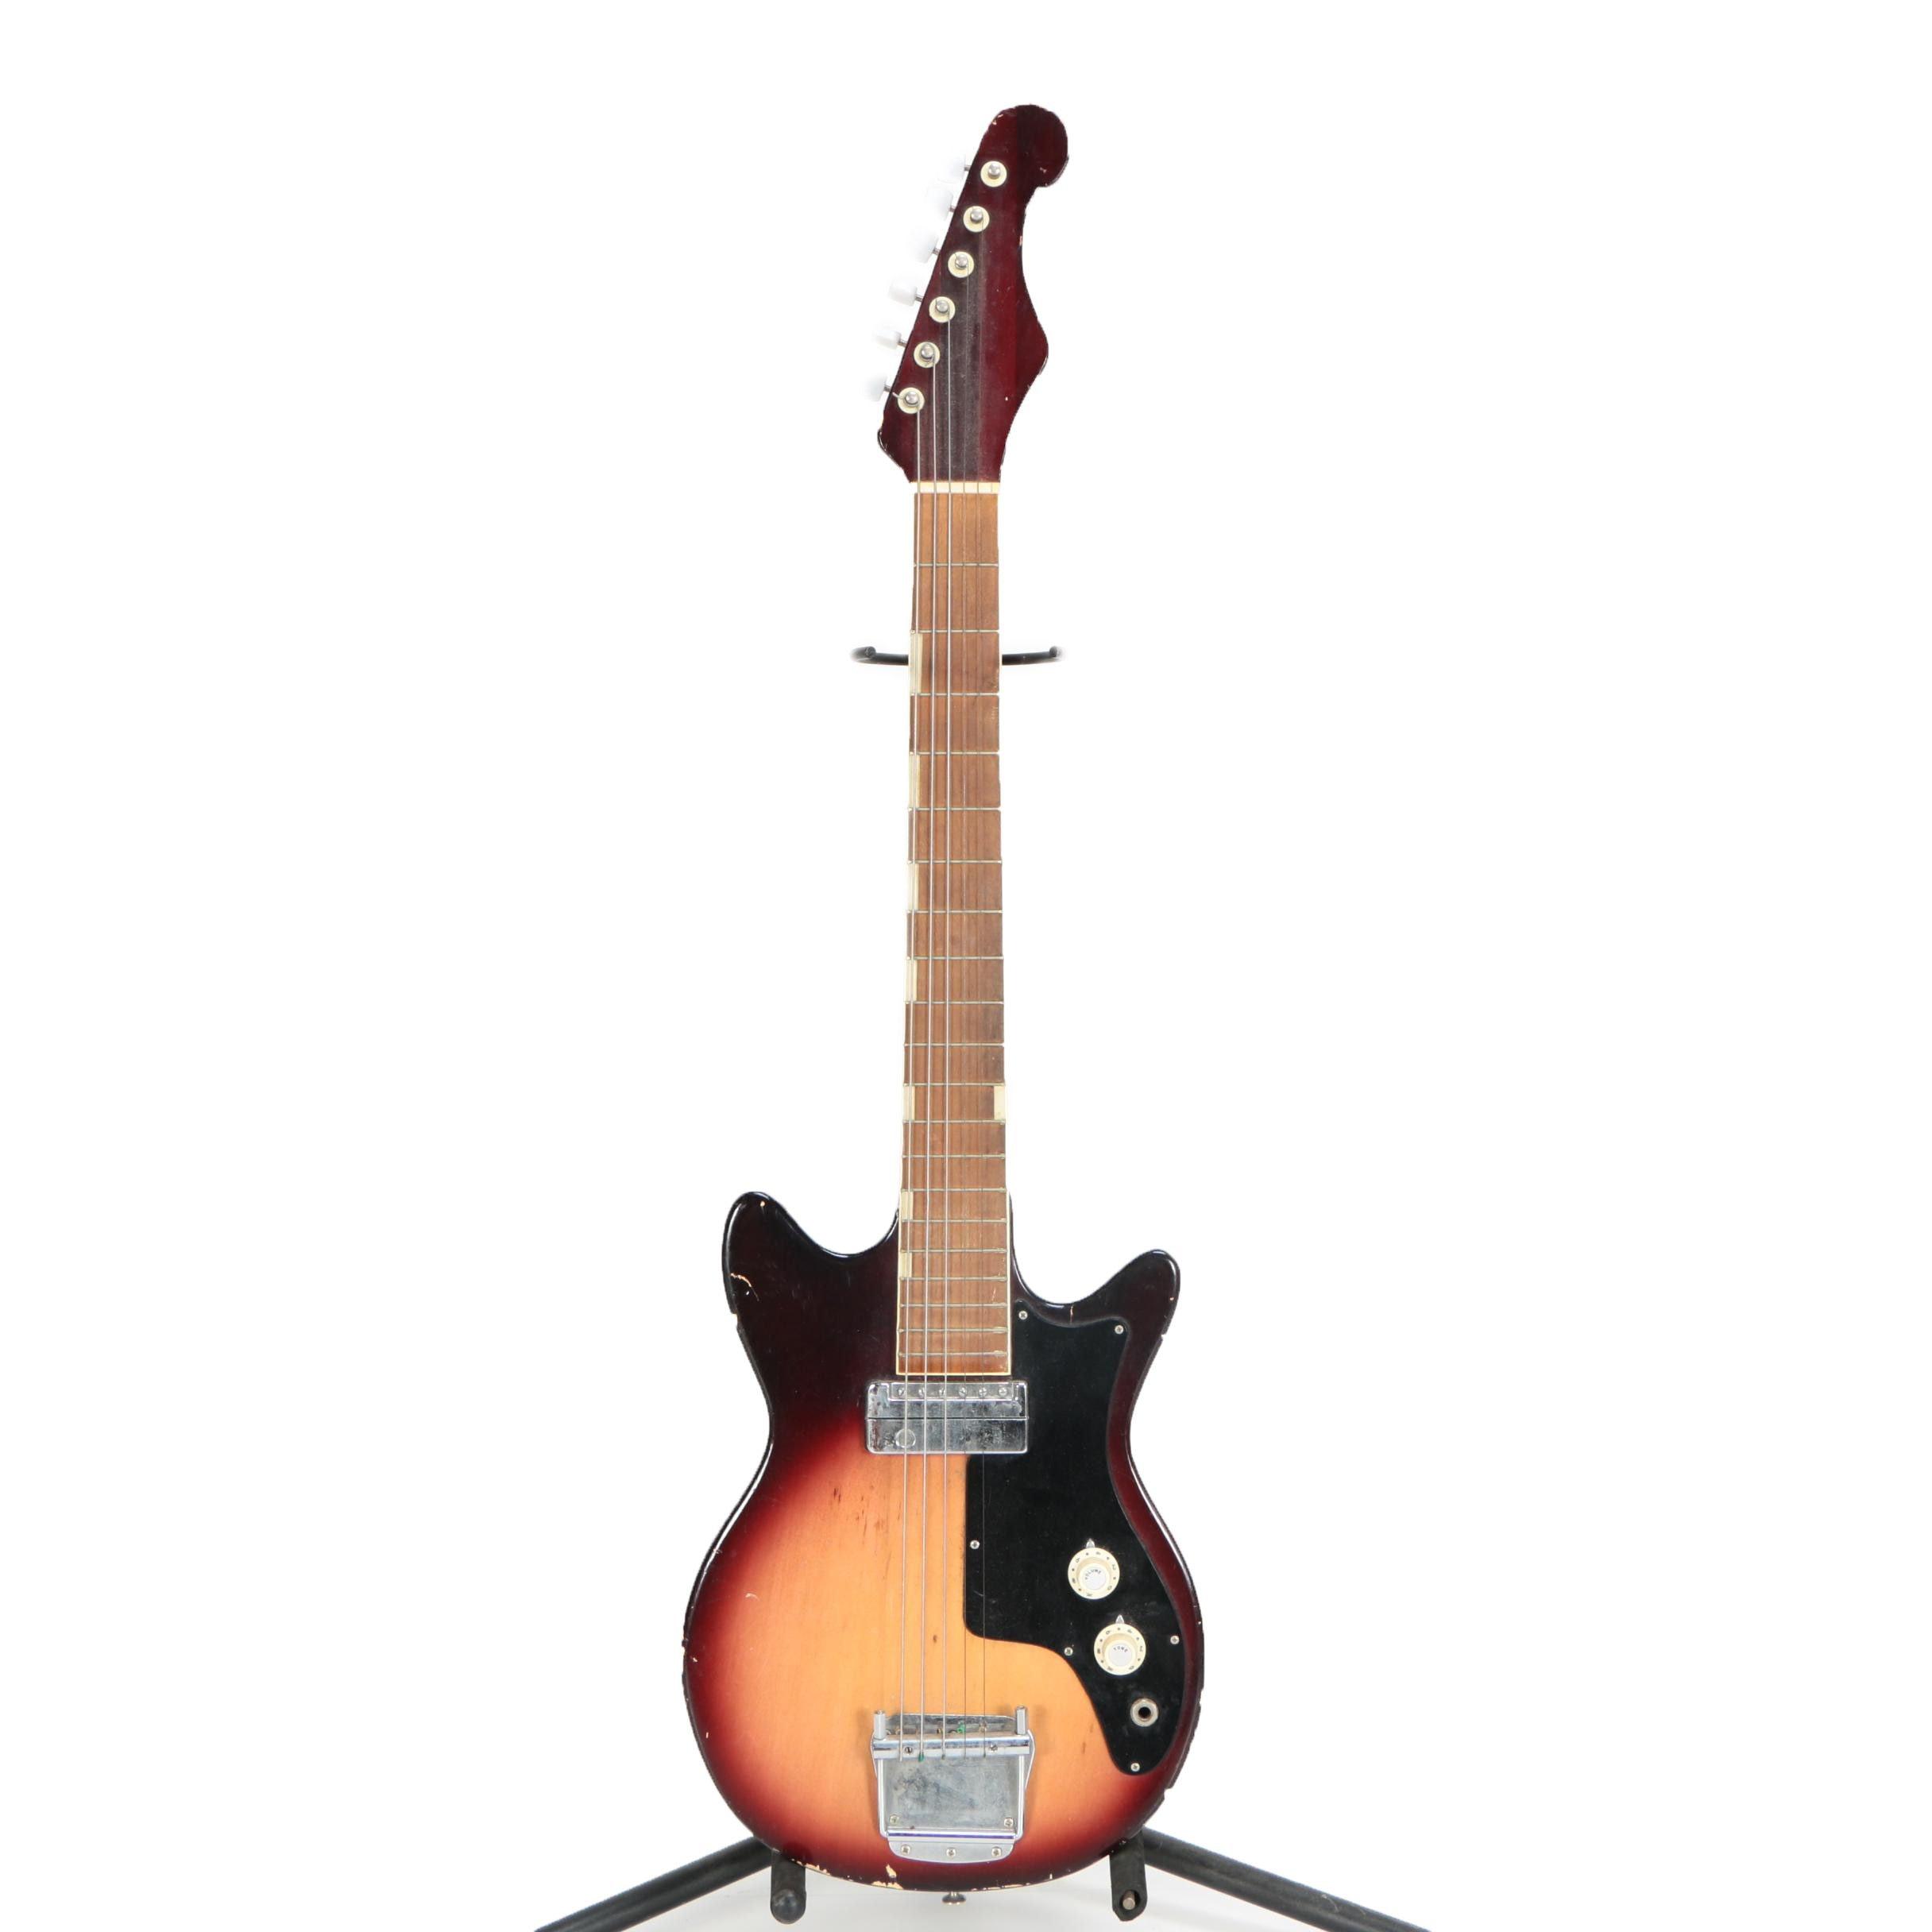 Vintage Teisco E 100 Japanese Electric Guitar With Tobacco Sunburst